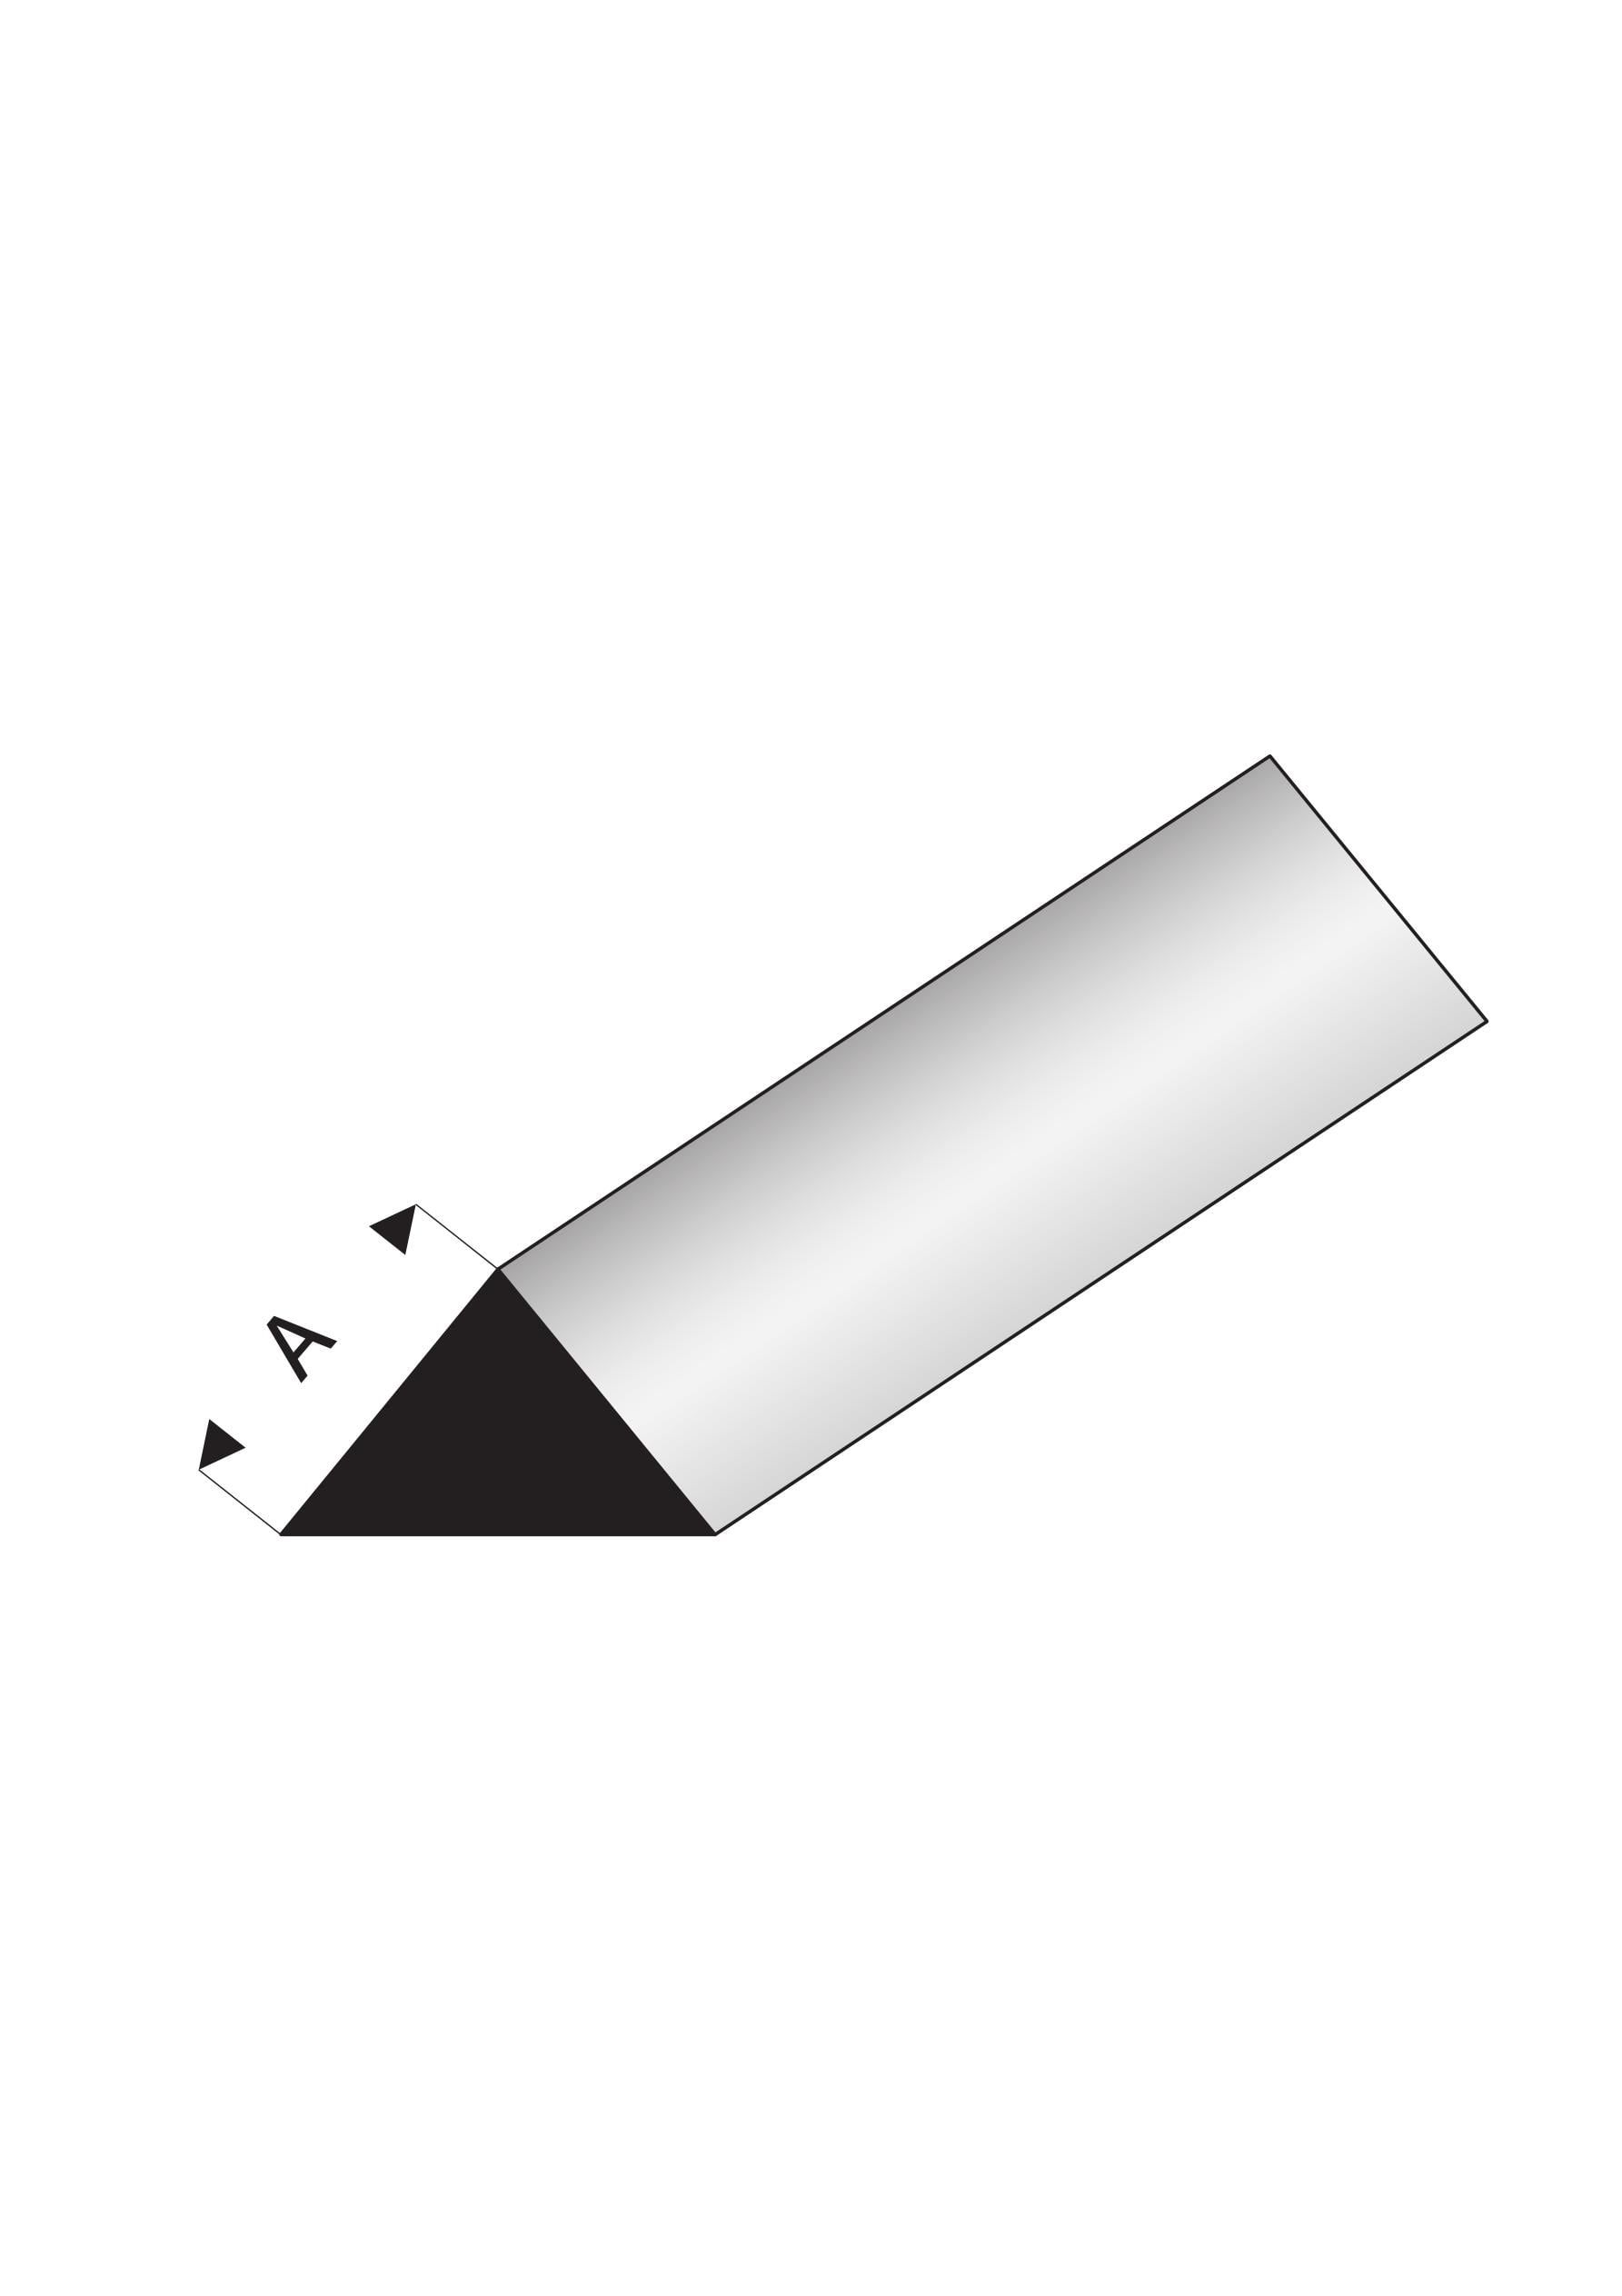 Super Styrene 90 degree Triangle Rod